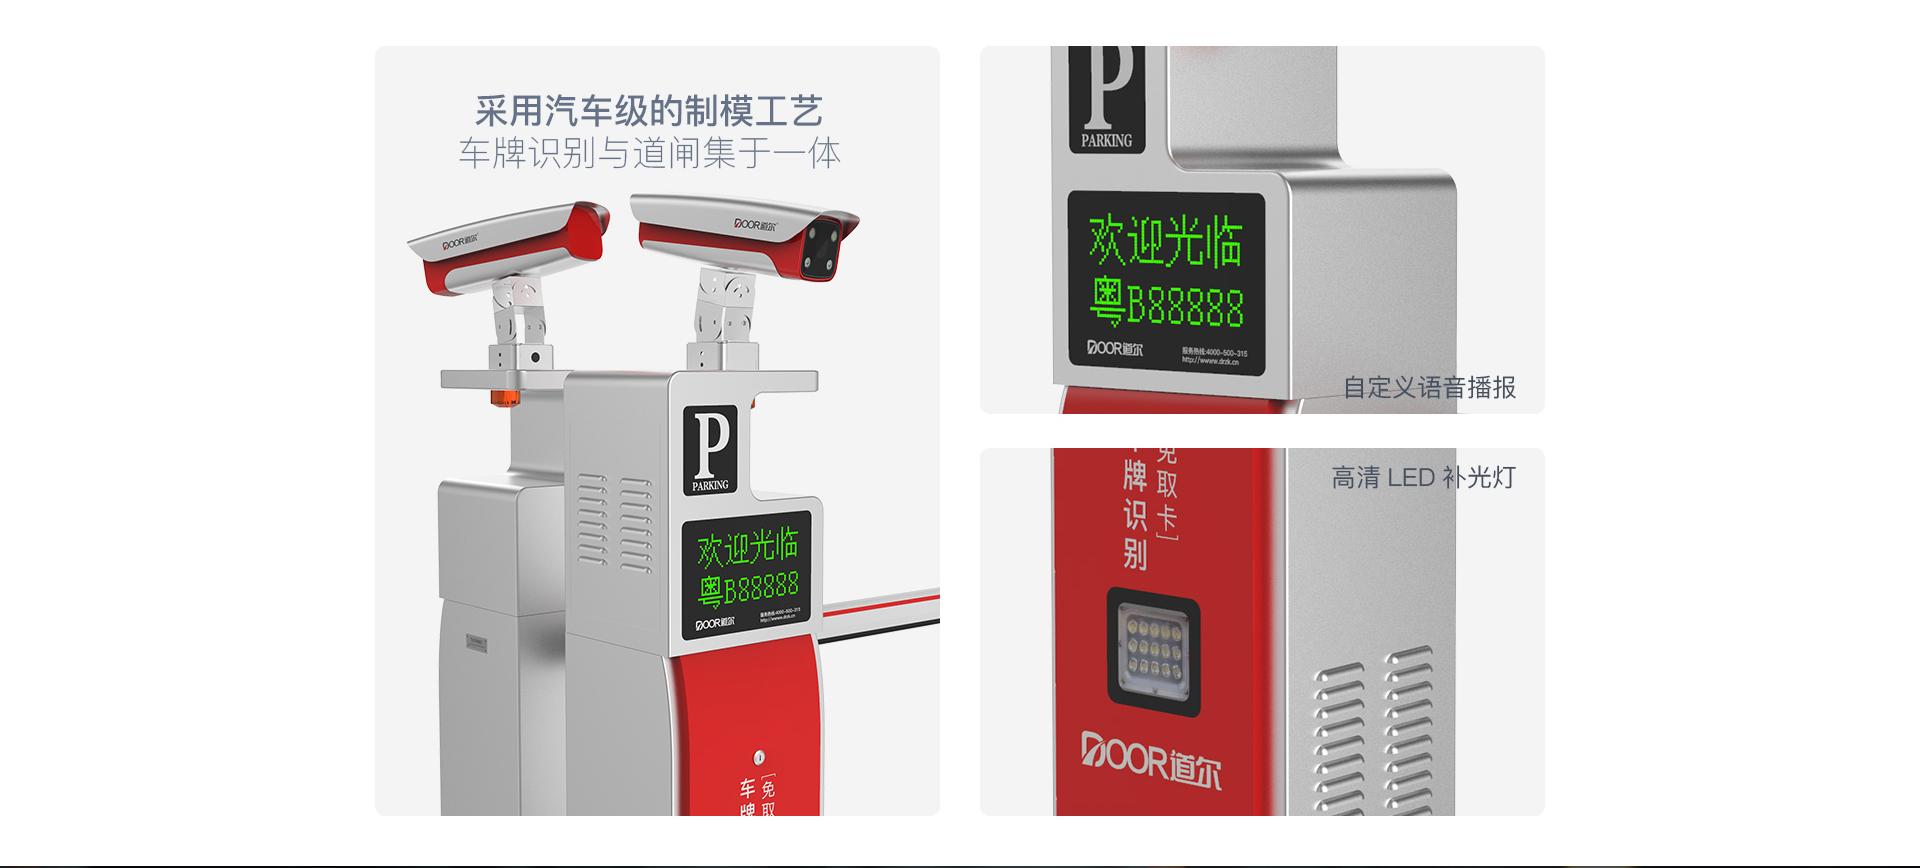 III型车牌识别系统